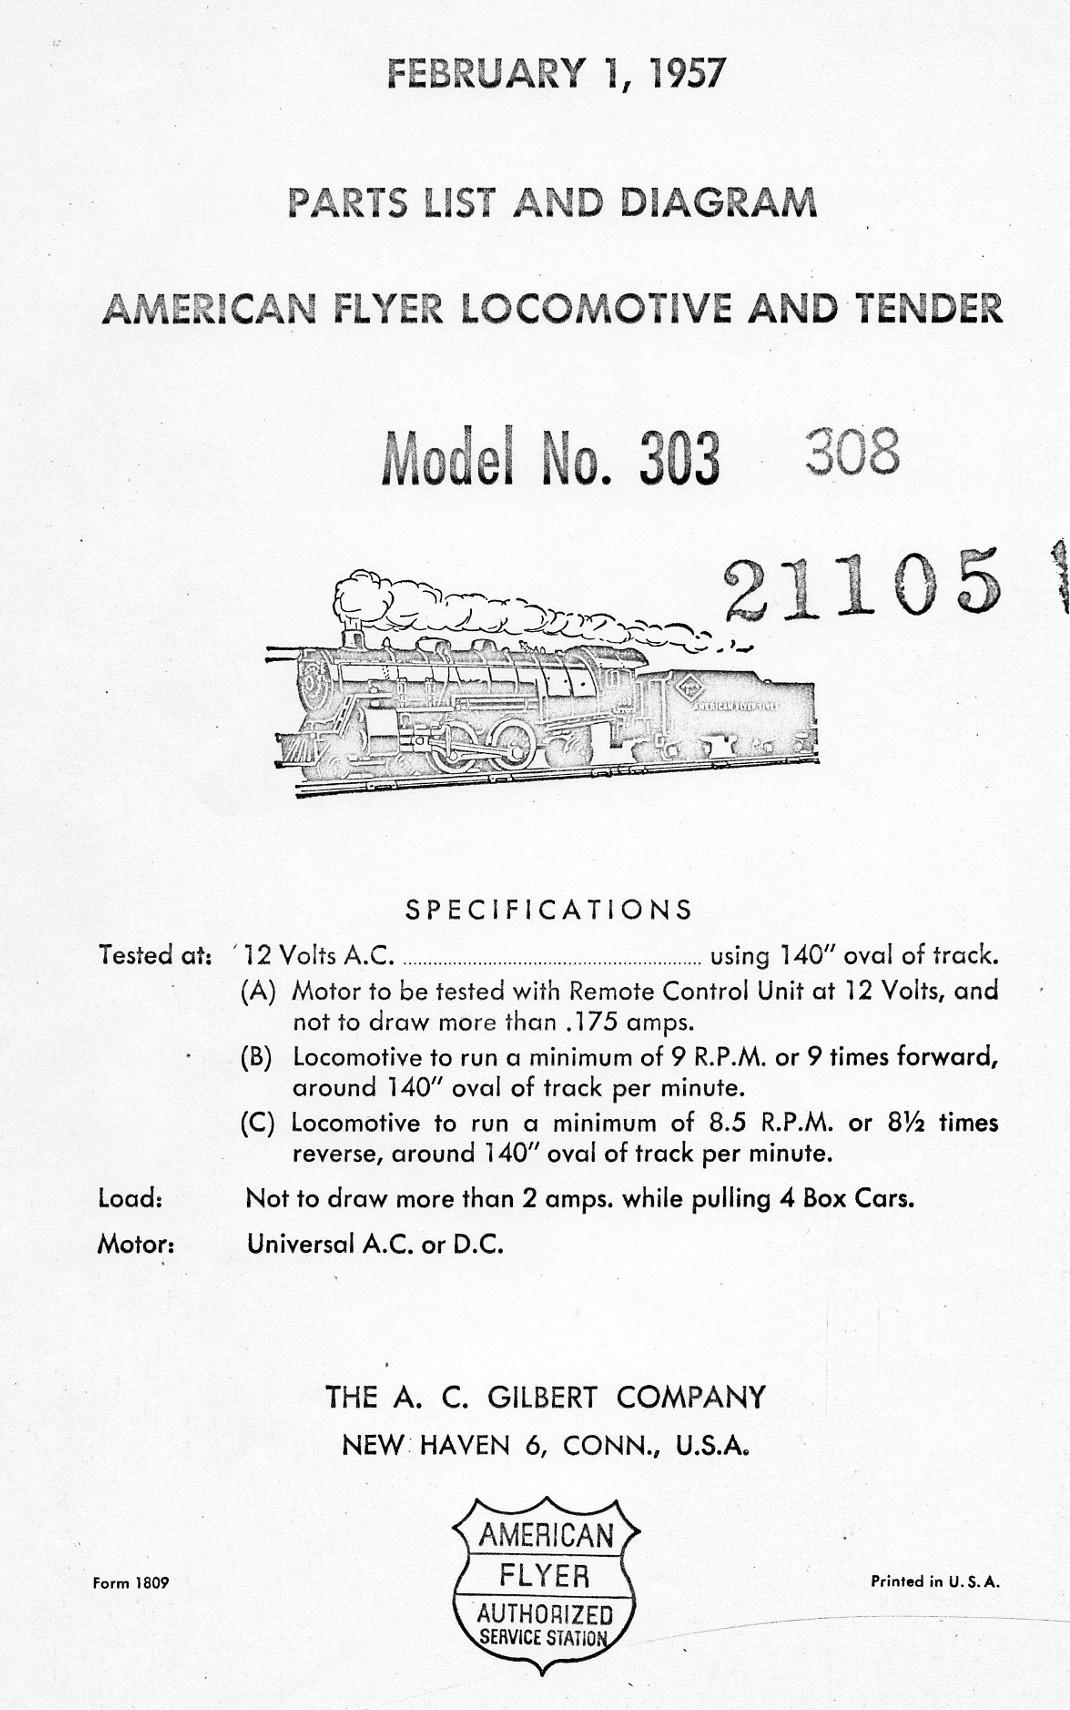 American Flyer Locomotive 303 Parts List and Diagram - Page 1